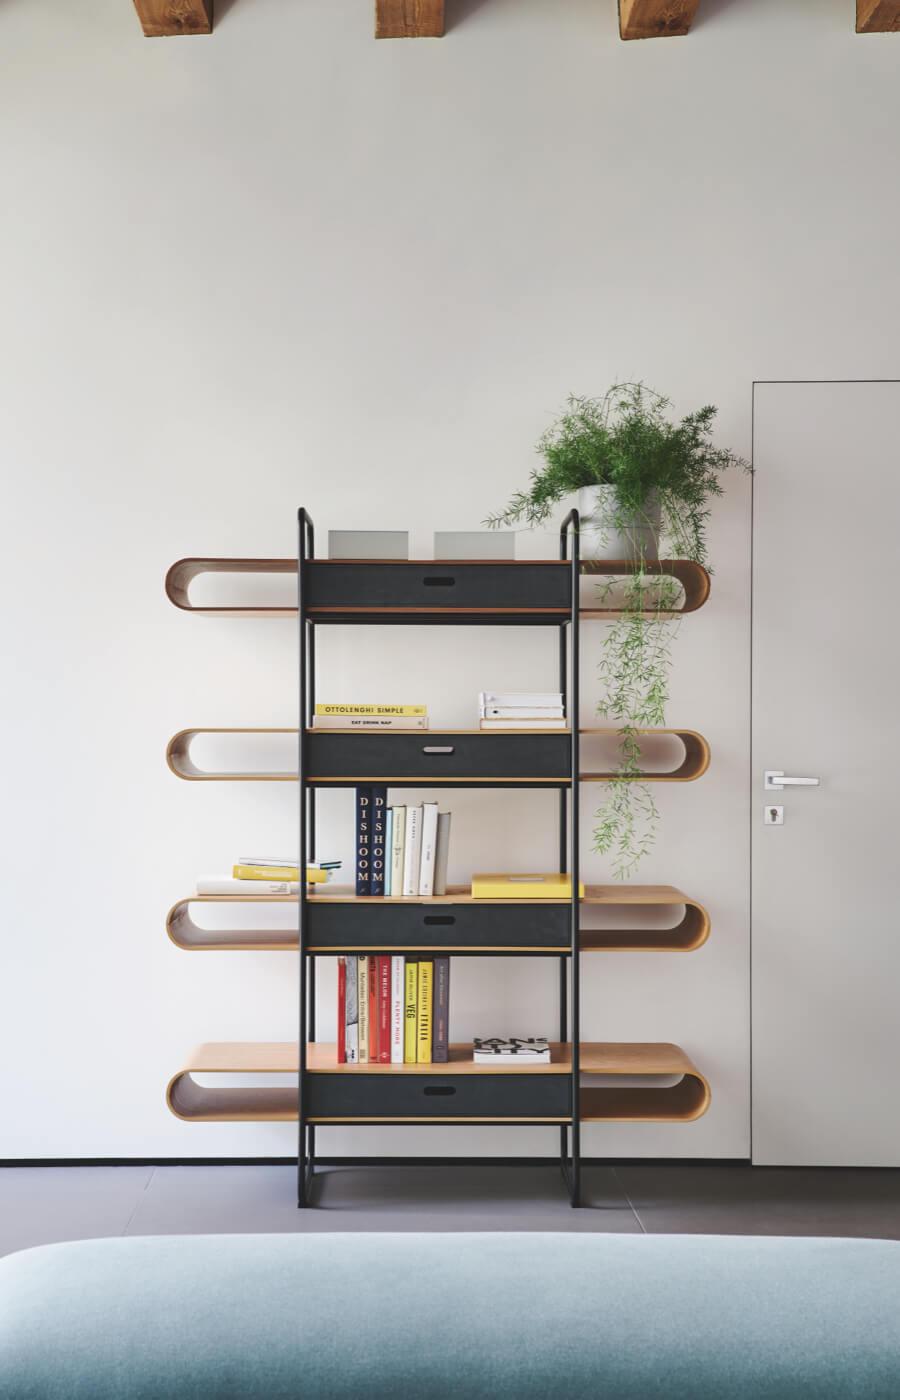 Midj - Libreria Apelle